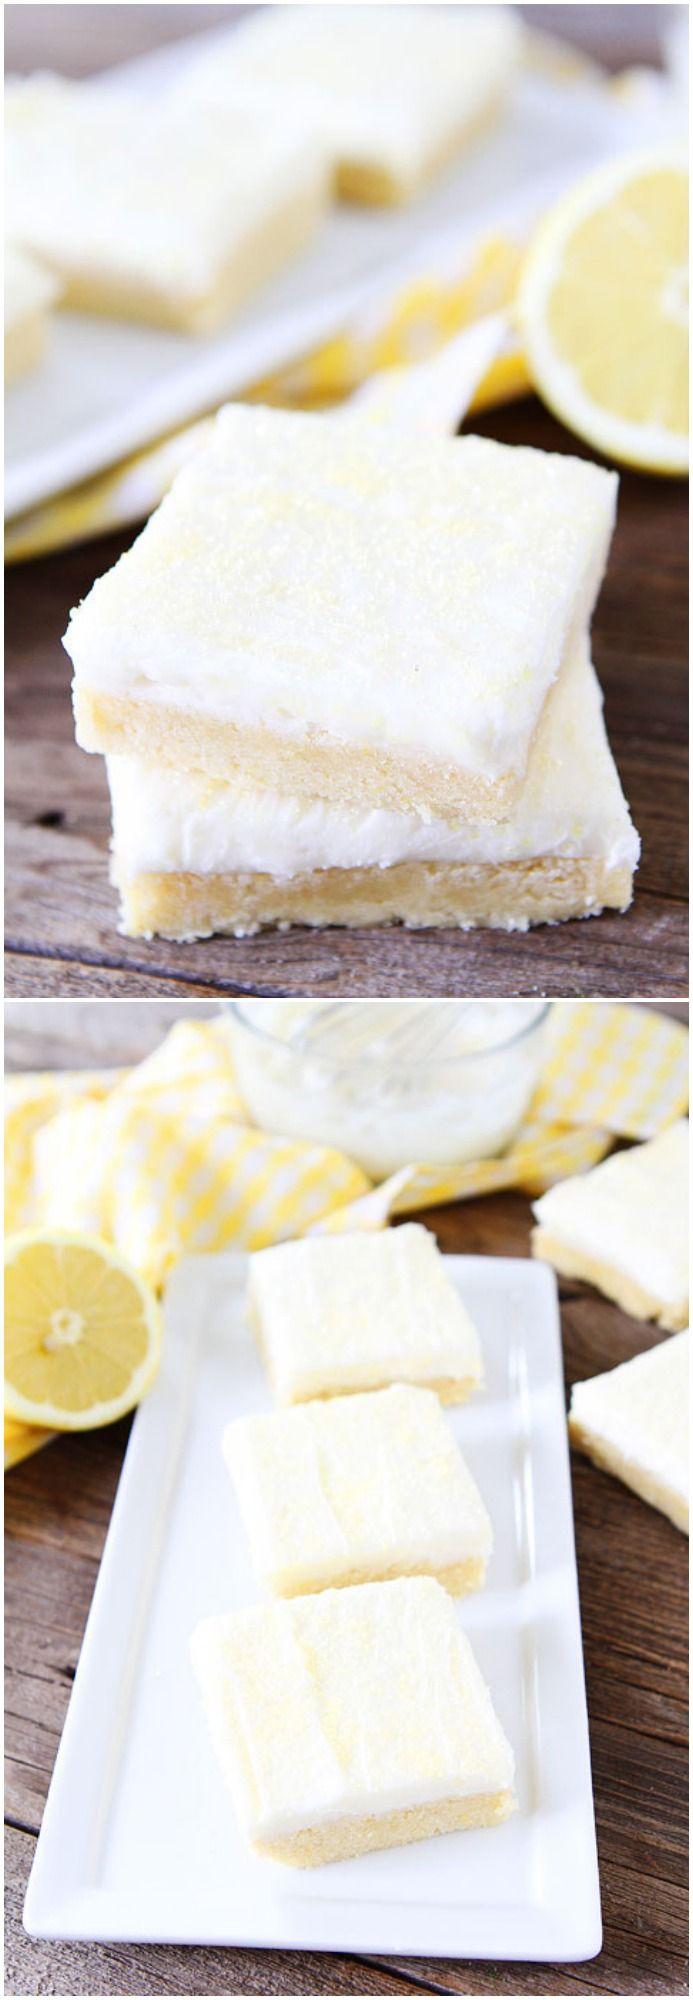 Lemon Sugar Cookie Bars with Lemon Cream Cheese Frosting on http://twopeasandtheirpod.com. The perfect summer dessert! #recipe #lemon #summer